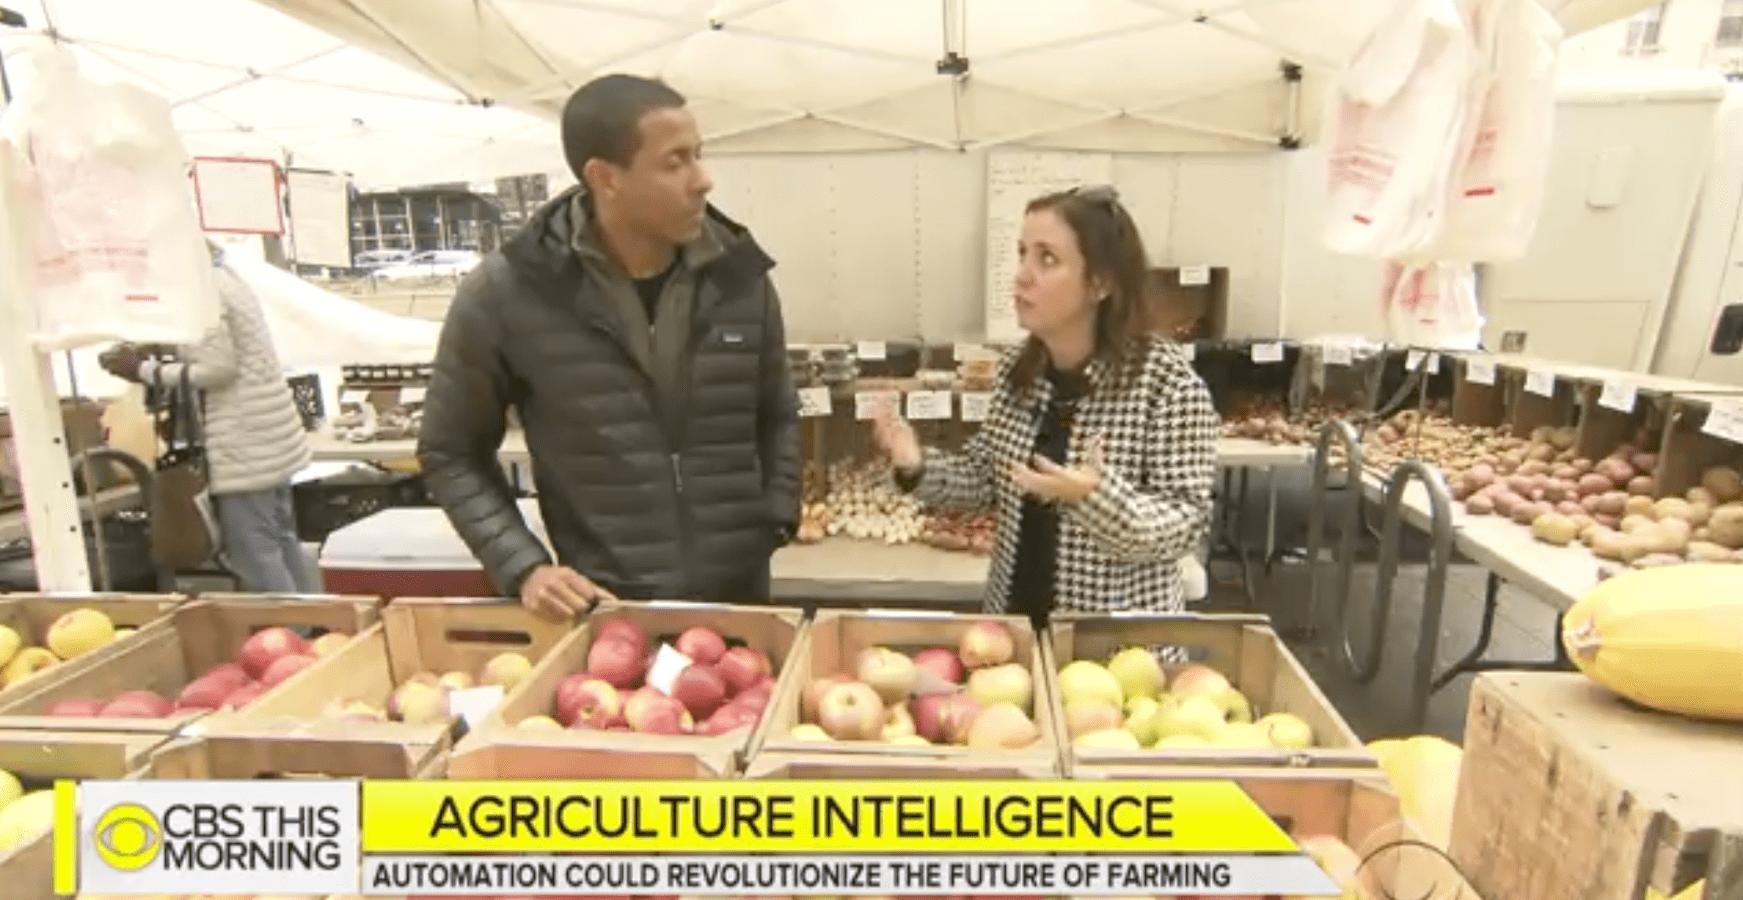 CBS News: Artificial Intelligence could Revolutionize Farming